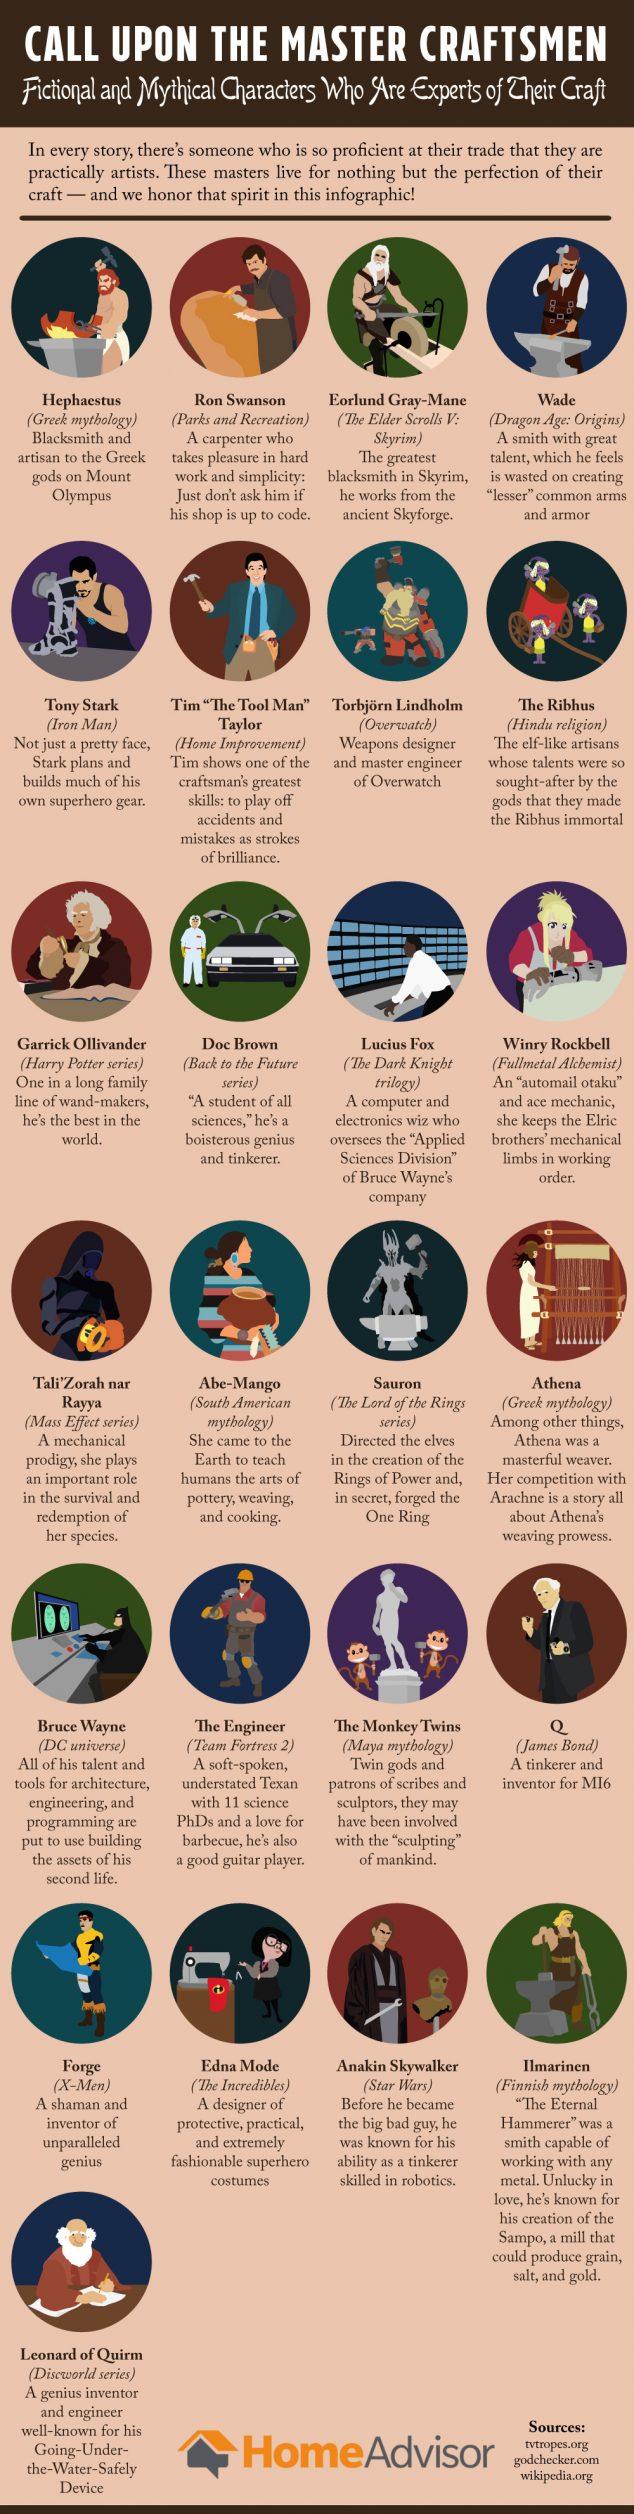 Master Craftsmen Infographic